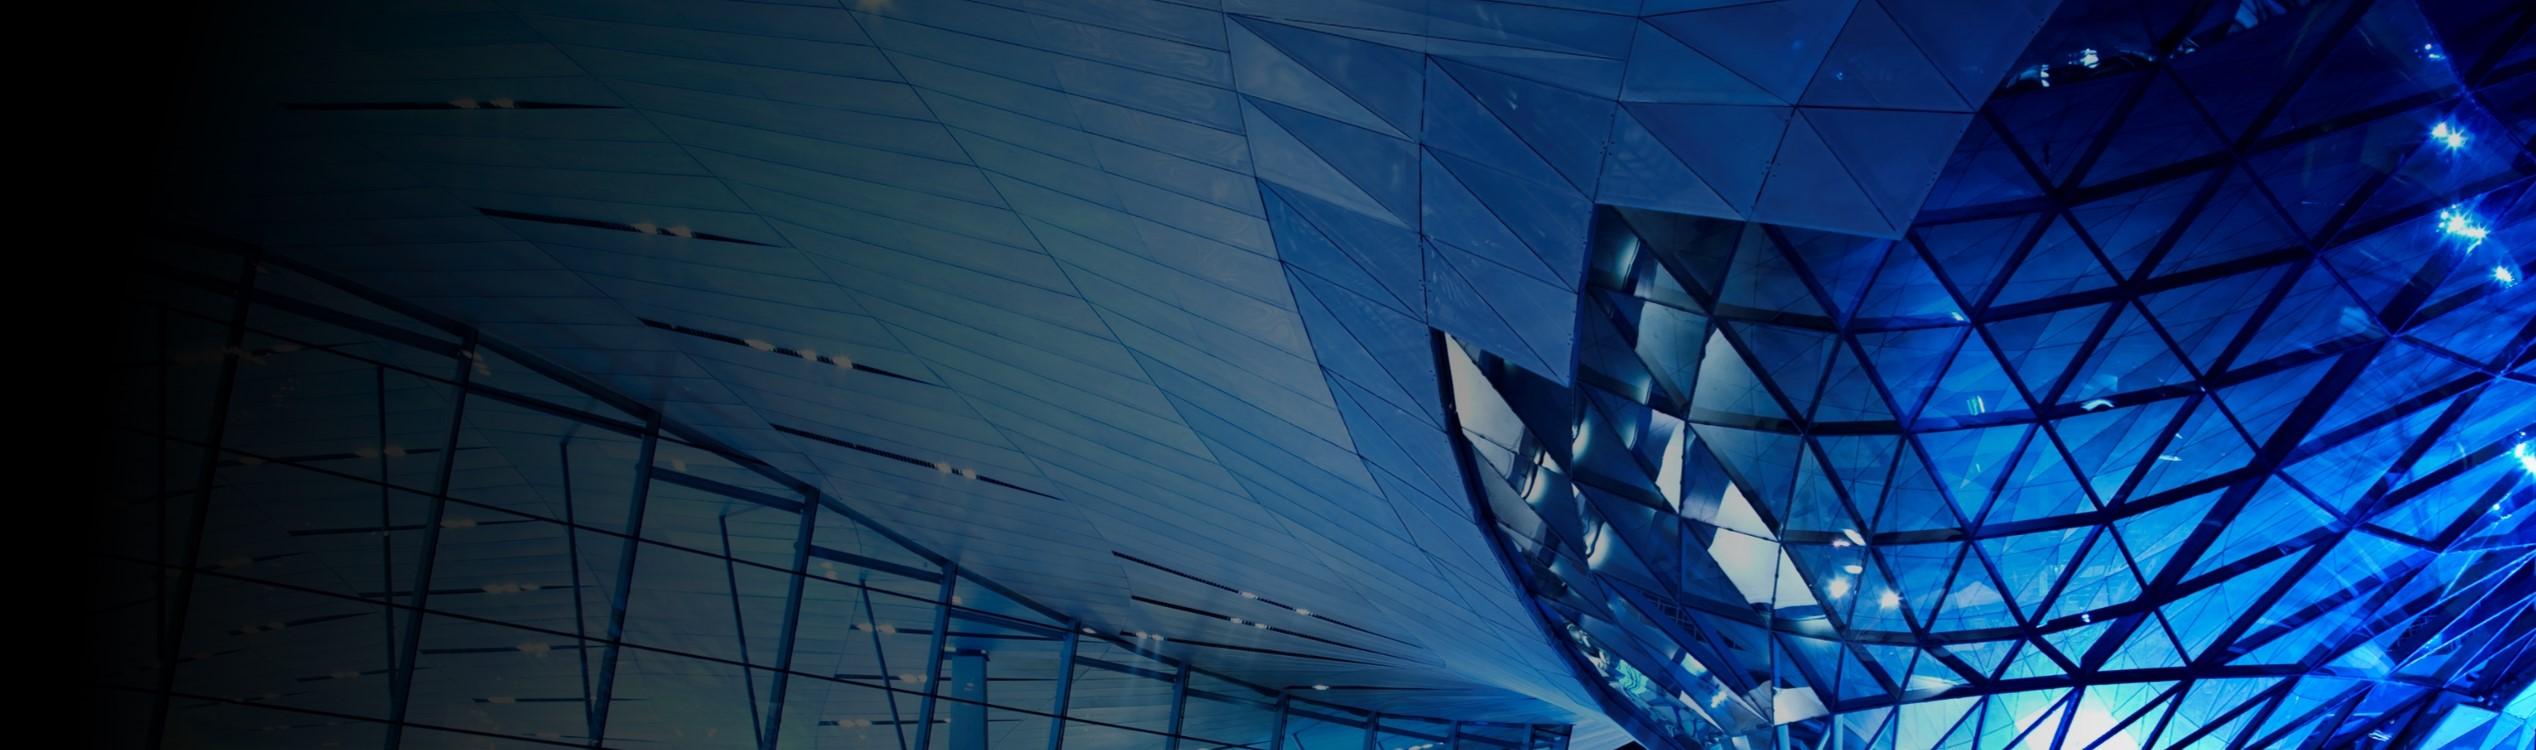 architecture-banner-34